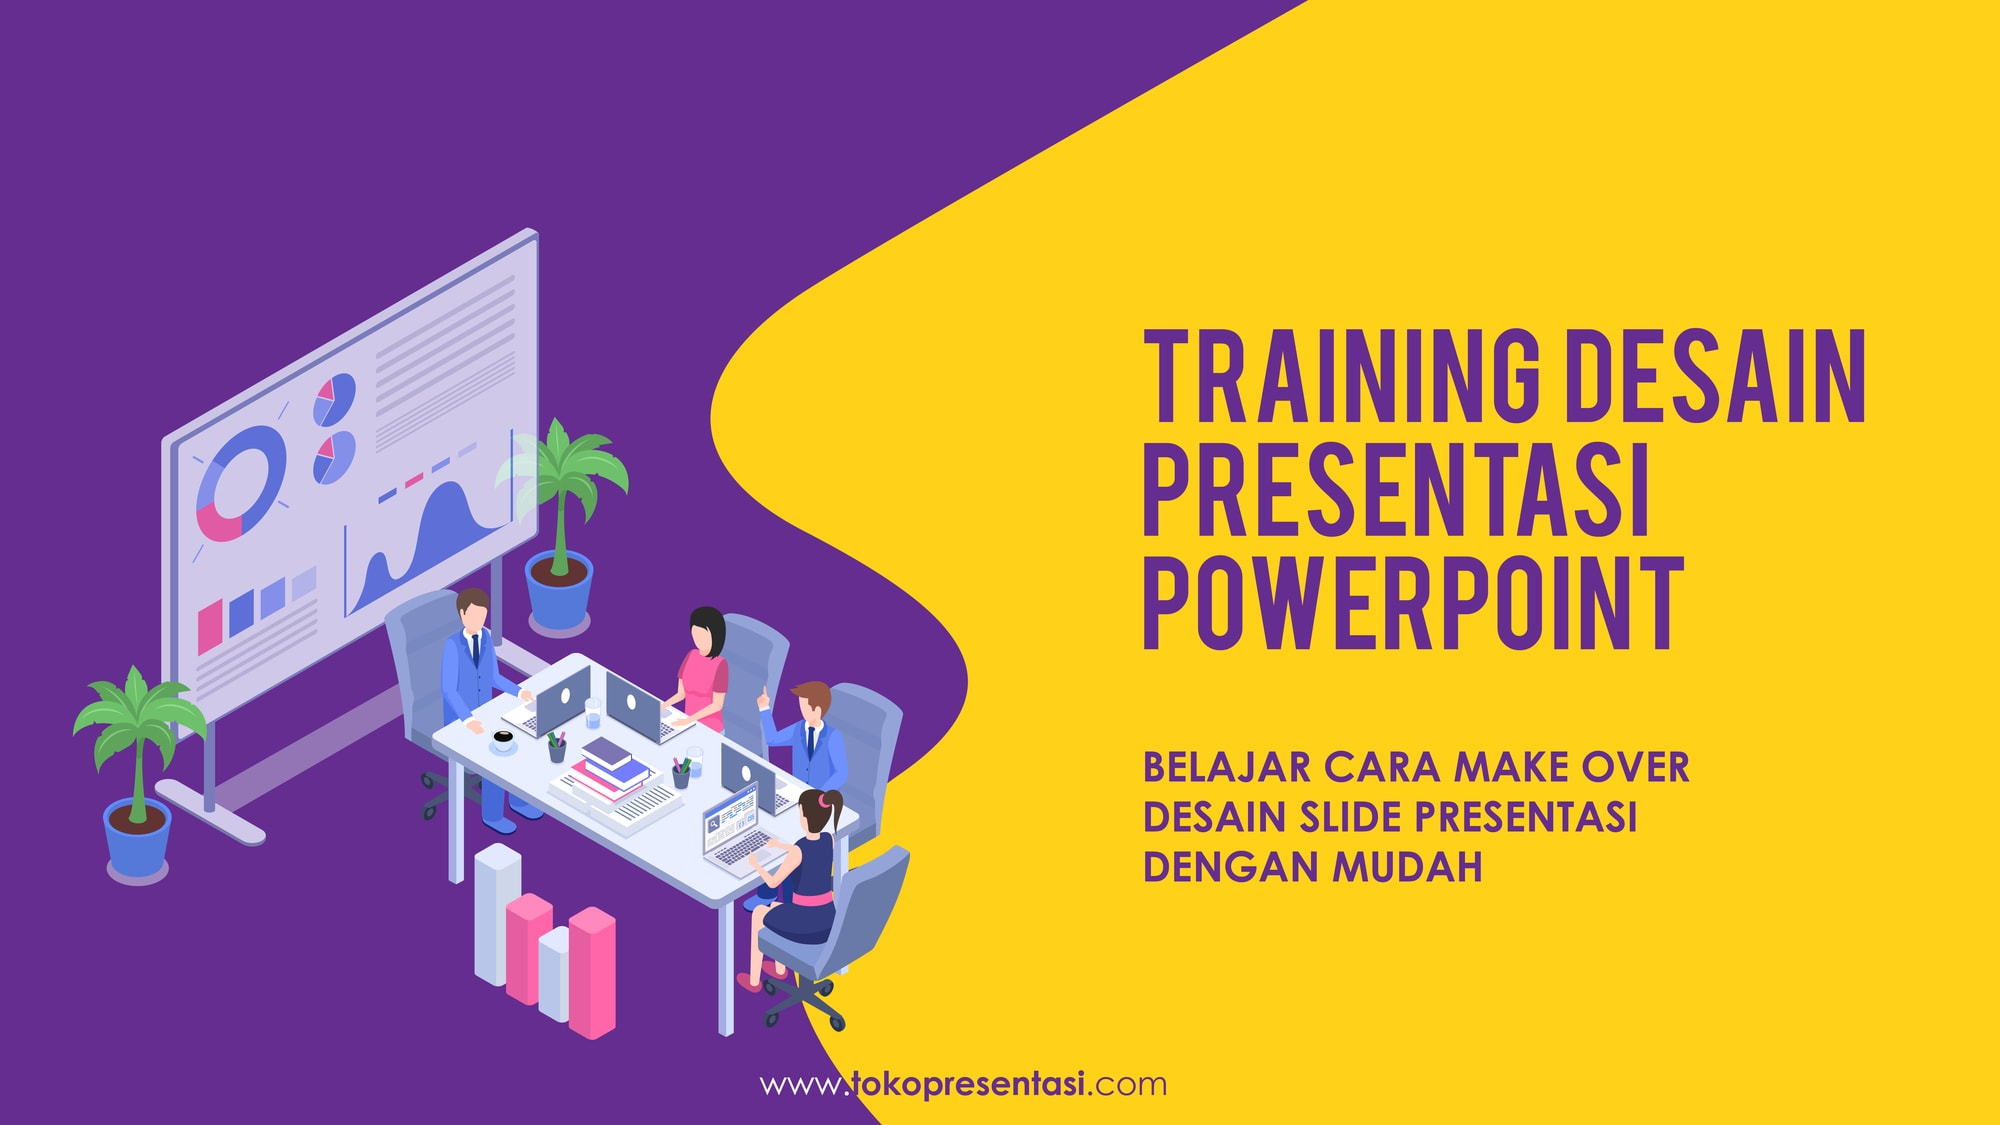 Pelatihan Desain Presentasi PowerPoint Markas Besar Polri Tokopresentasi